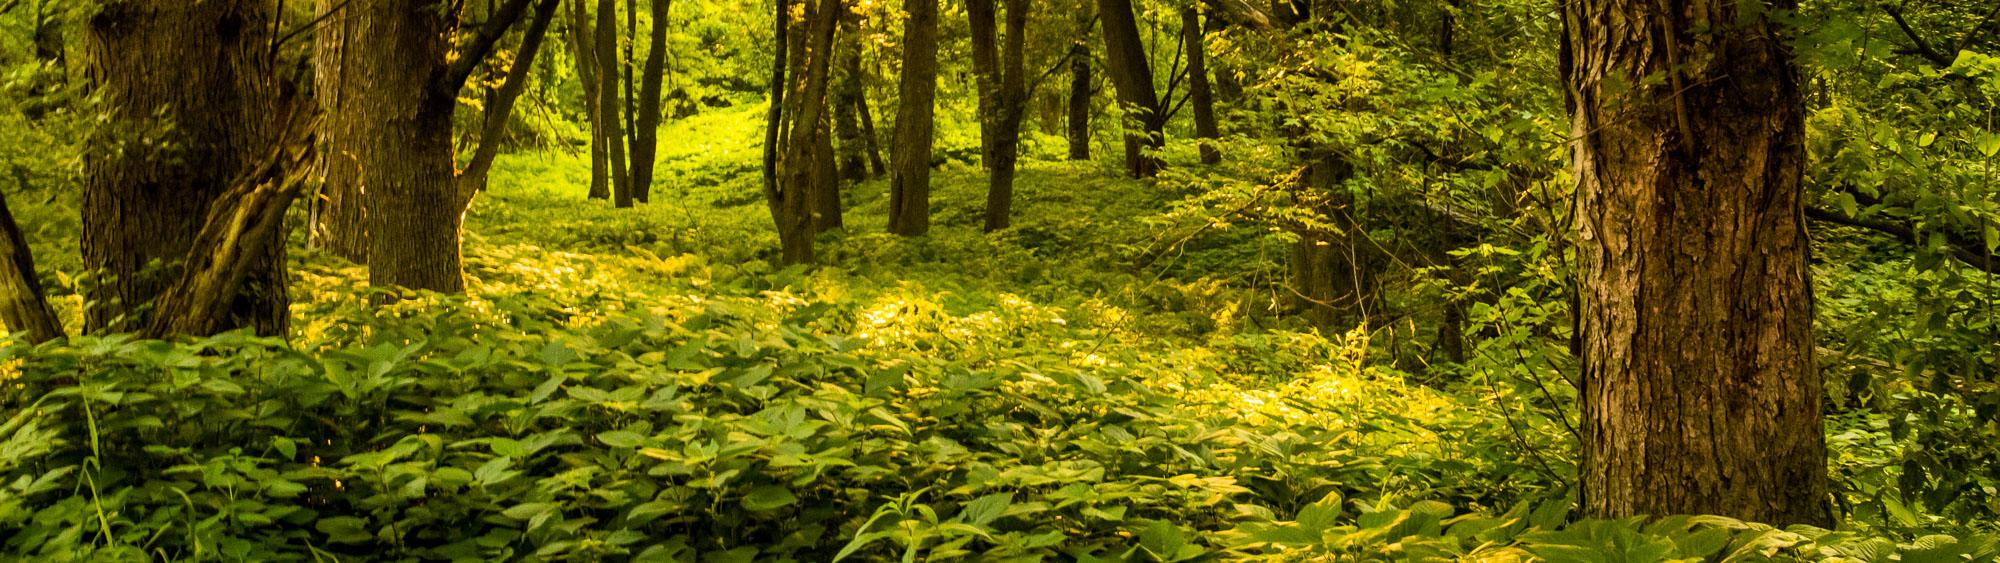 rich floodplain fairy forest